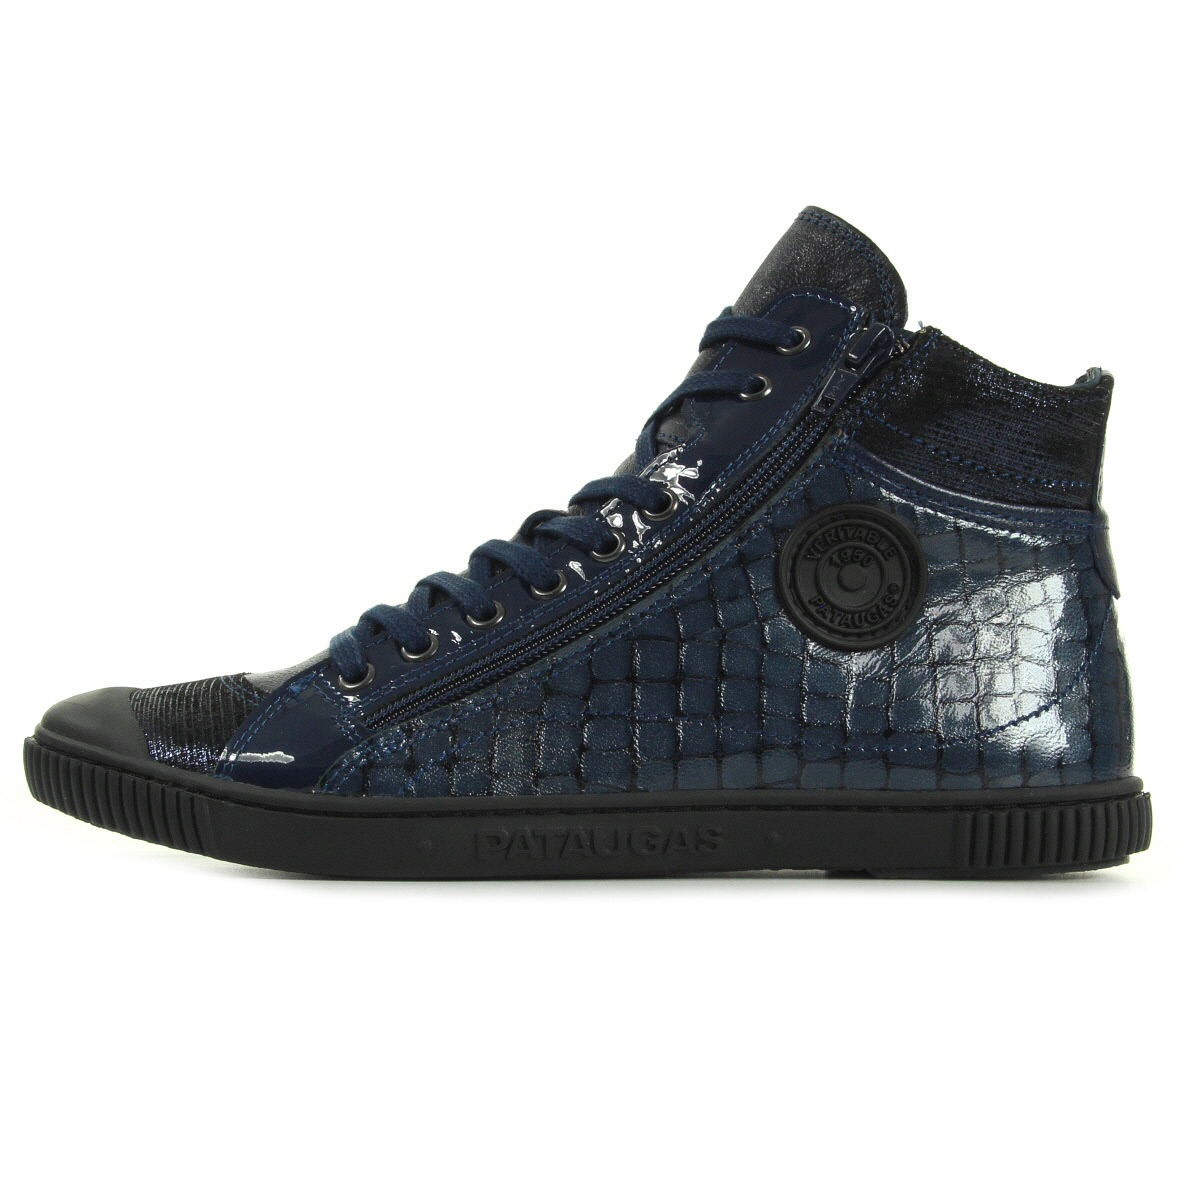 Pataugas Chaussures Chaussures Femmes Femmes Ebay mnN8O0vw